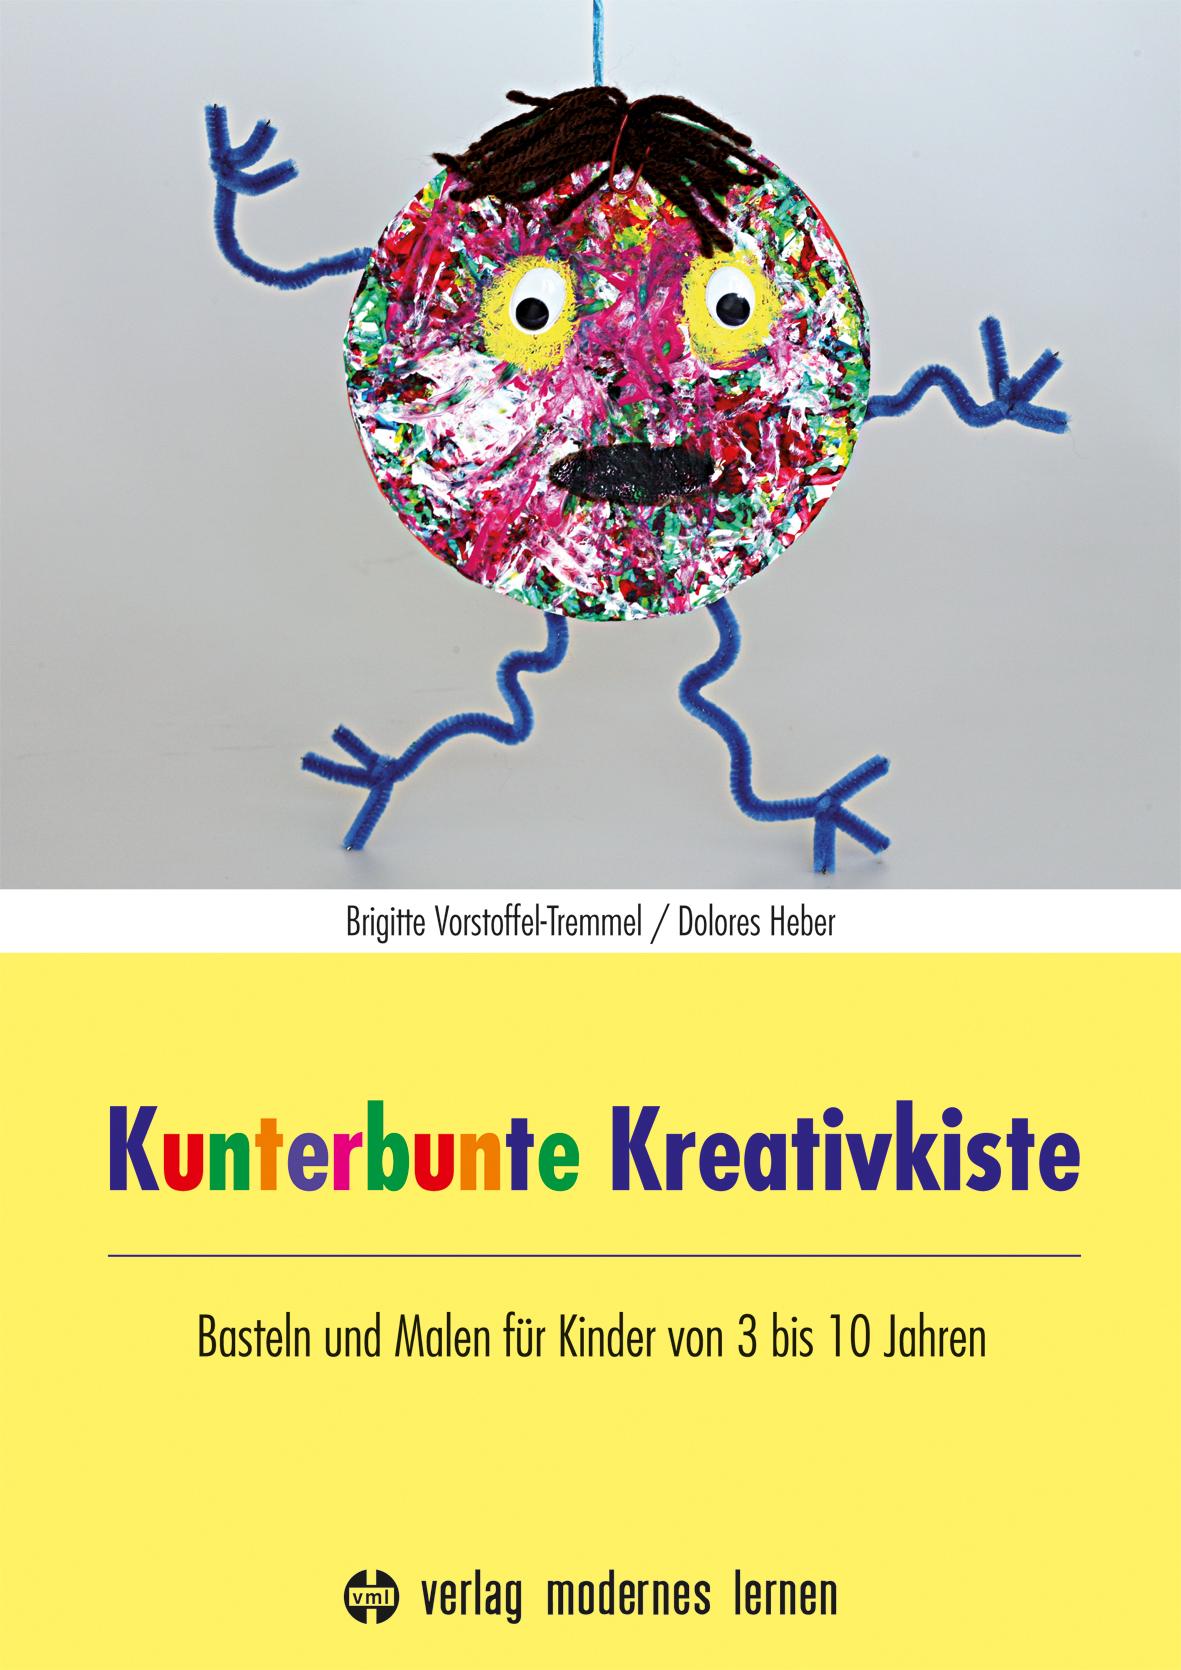 Kunterbunte Kreativkiste Schone Bastelideen Fur Kinder Ab 3